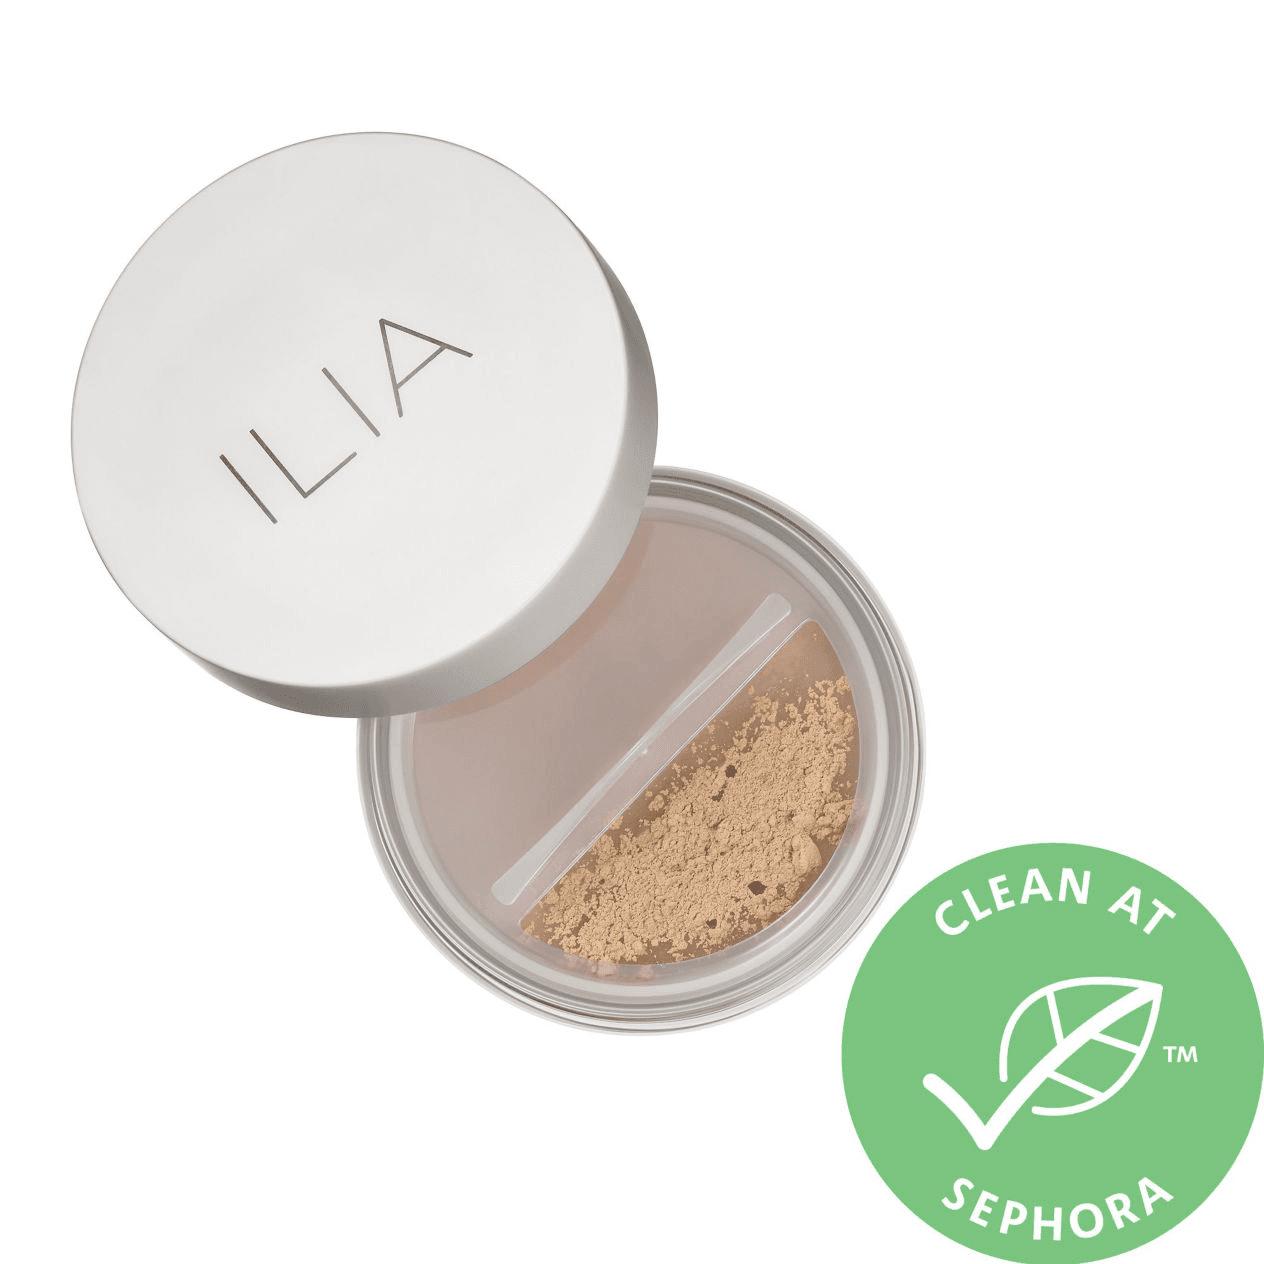 Ilia Flow-Thru Radiant Translucent Powder SPF 20